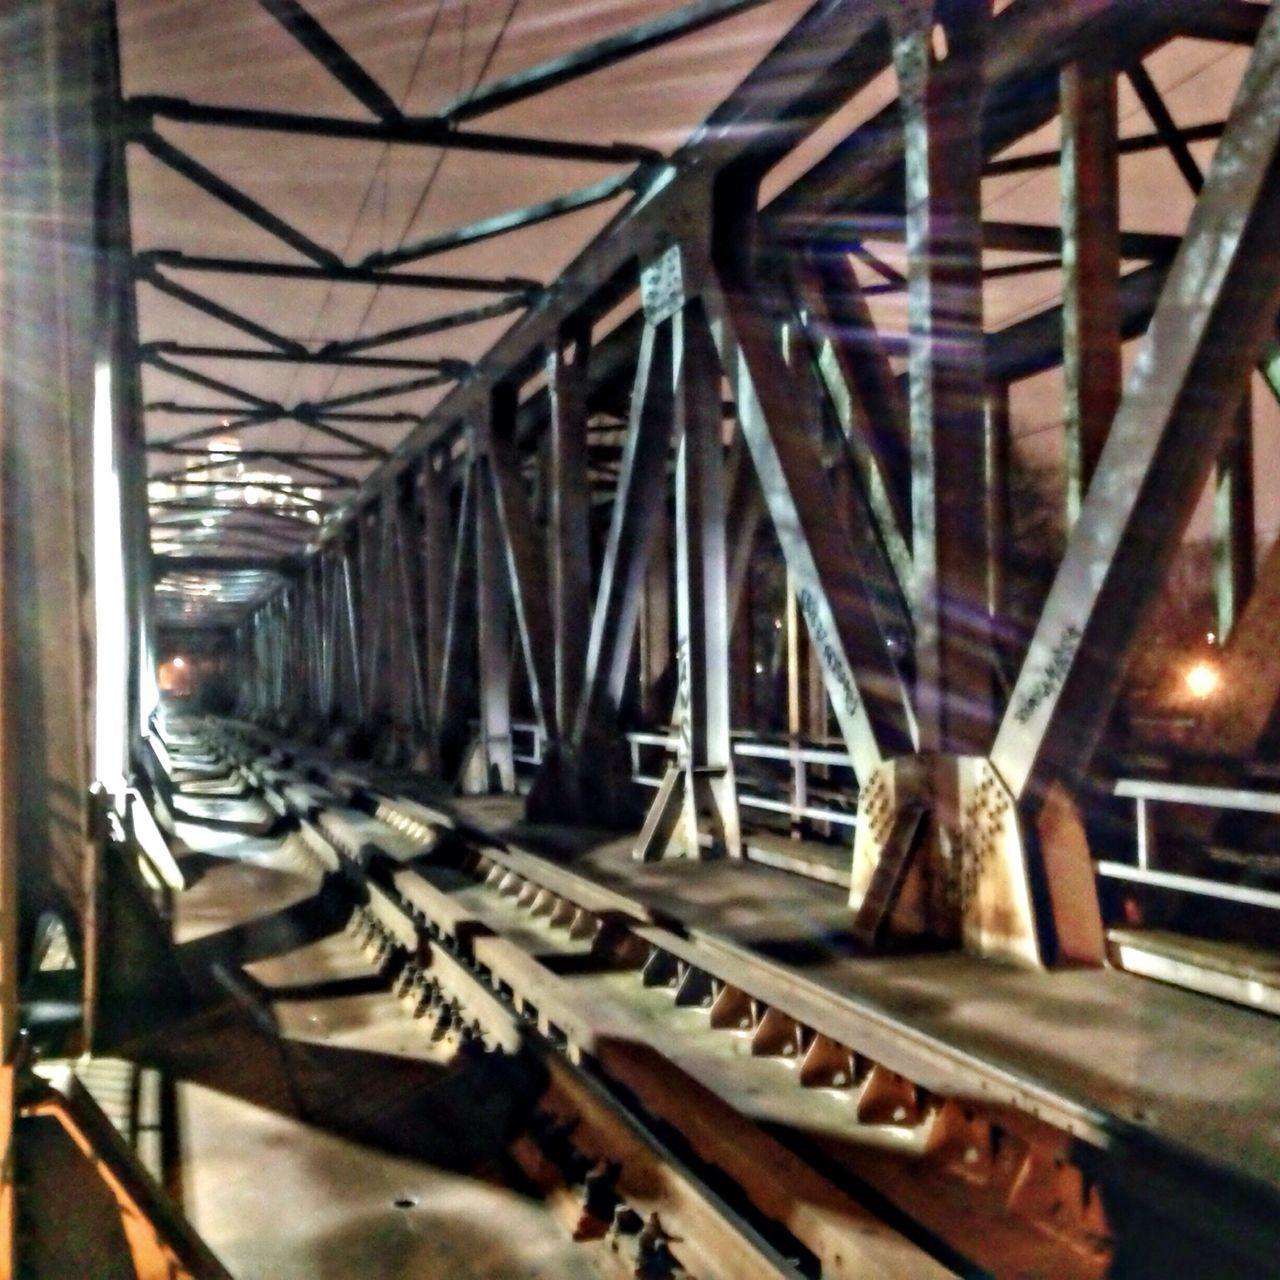 Railway bridge Bridge #railway #railwaybridge #night Nightphotography #castle Trencin #snapseed #iphonephoto Iphonephotography